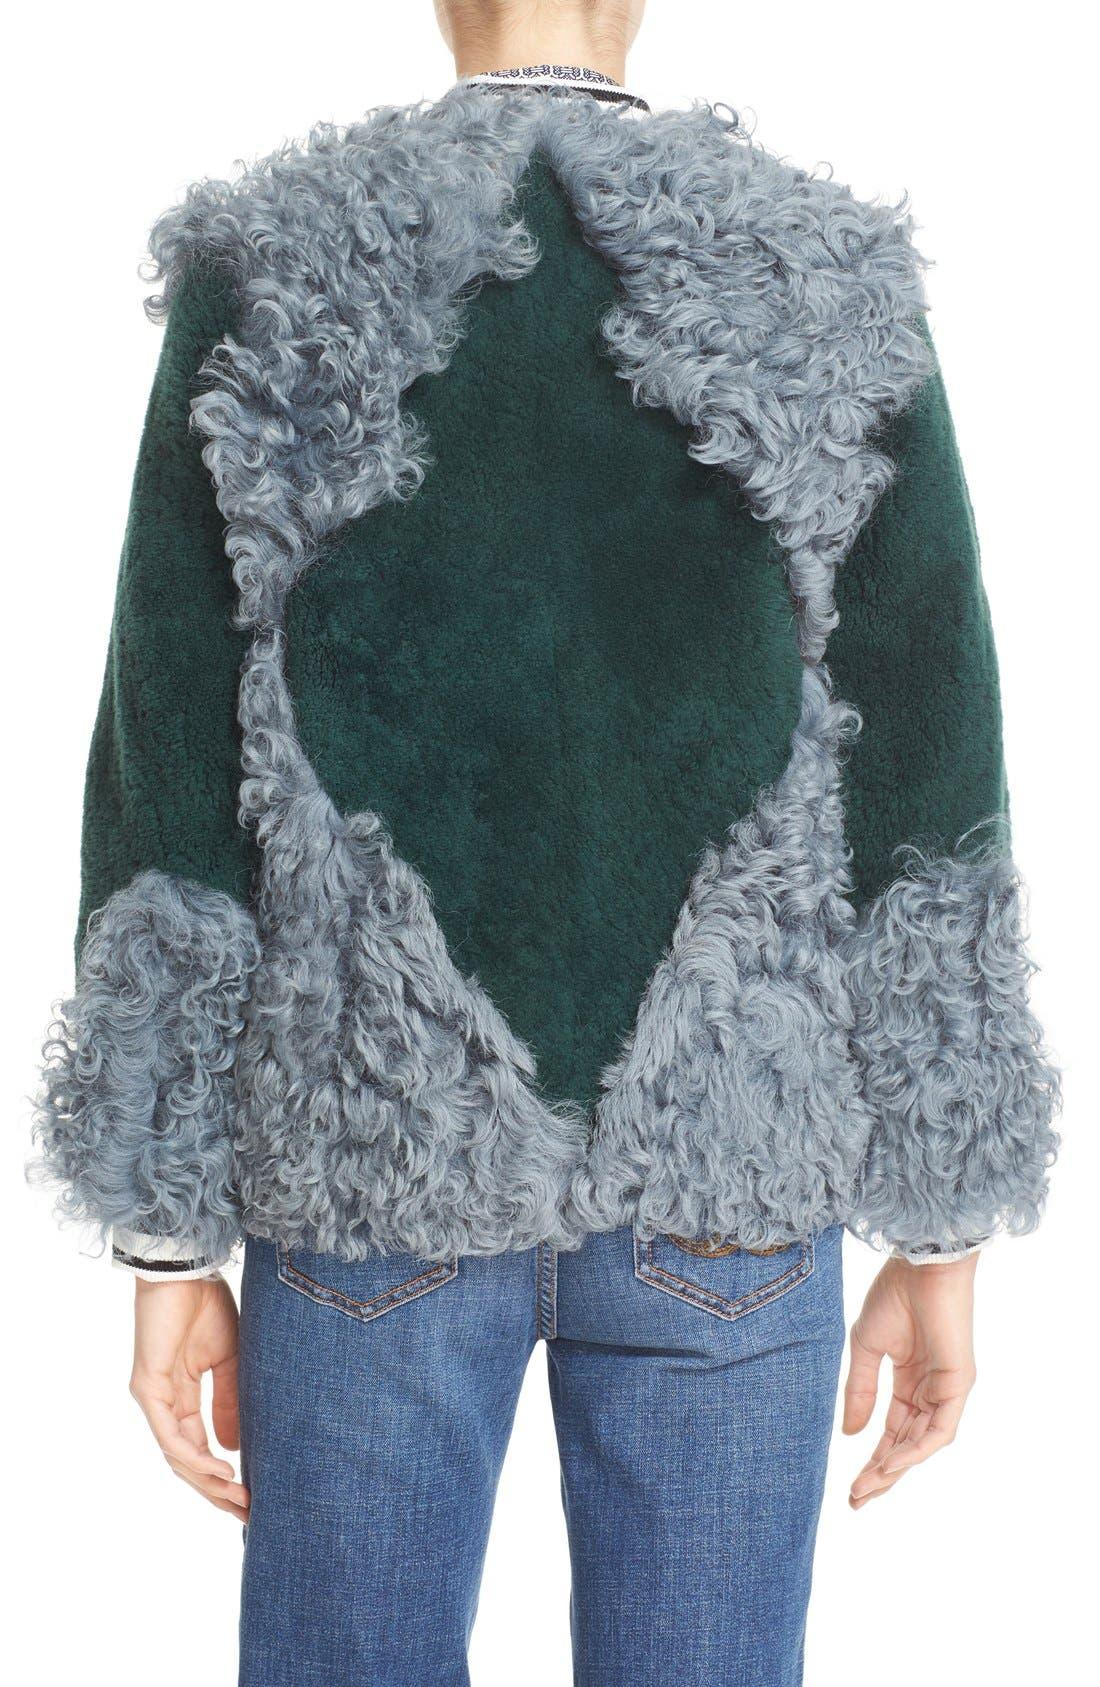 'Bristol' Colorblock Genuine Shearling Jacket,                             Alternate thumbnail 2, color,                             318